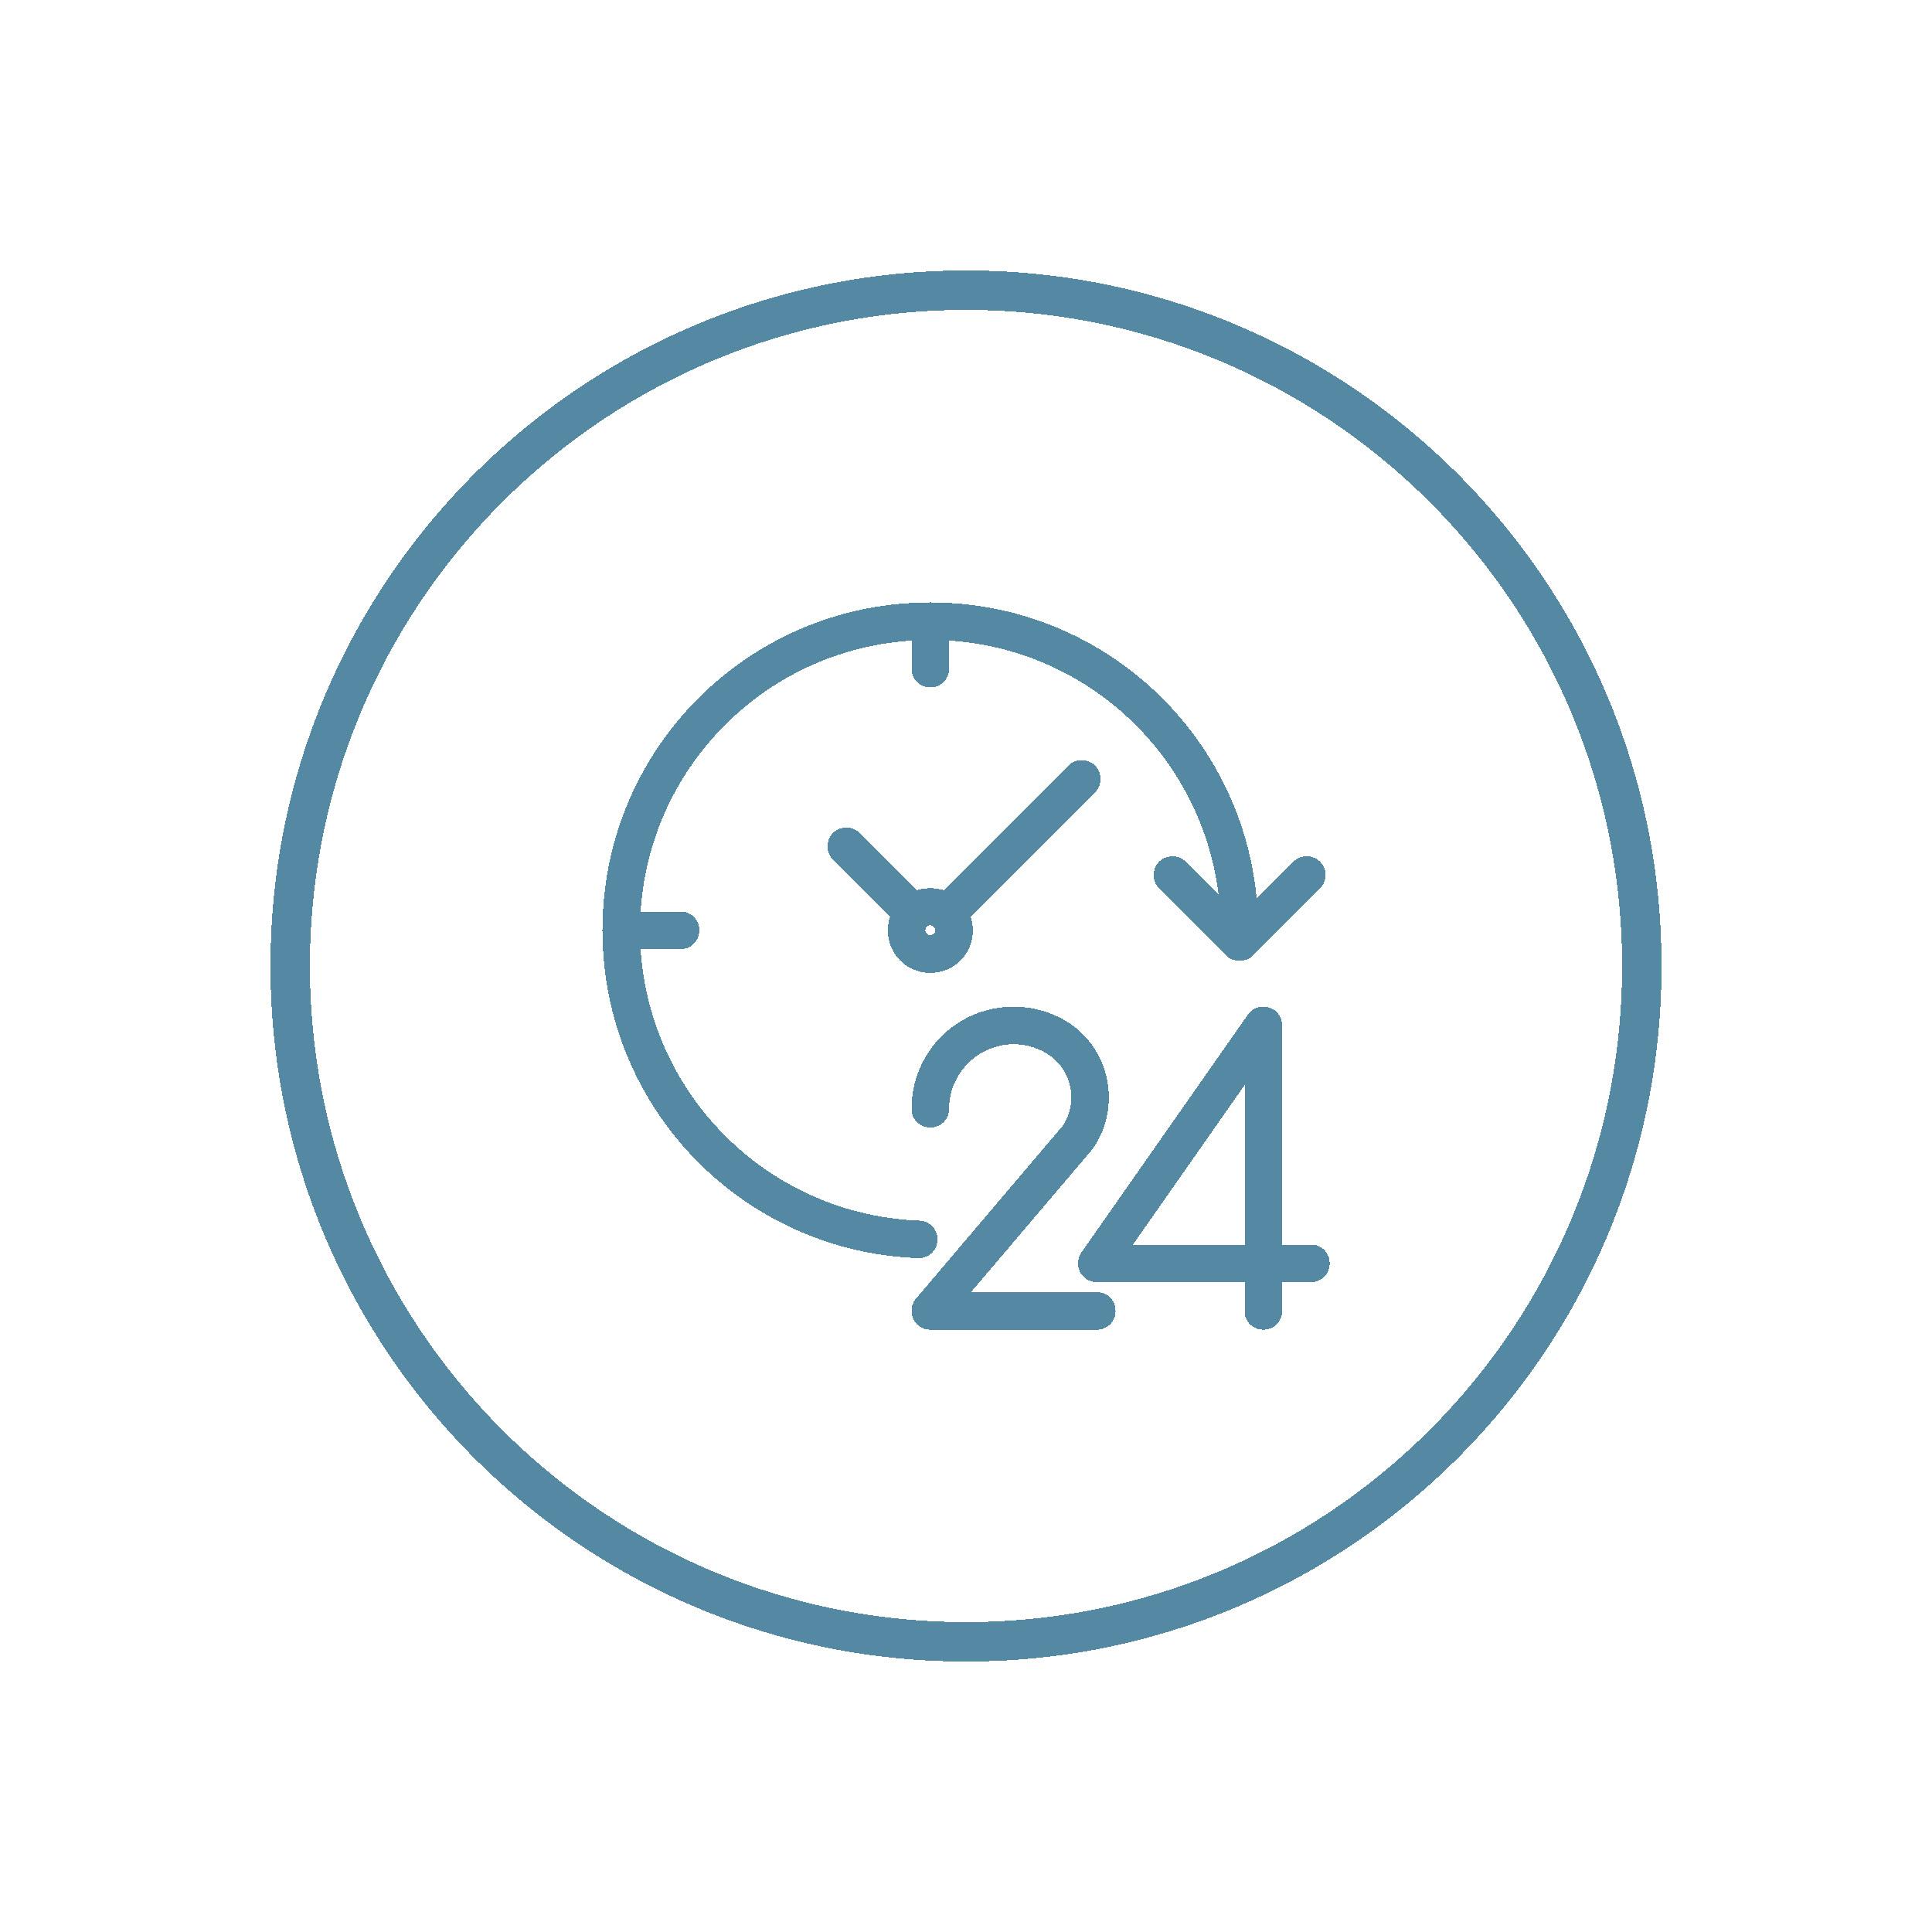 Схема метро москва 2020 год распечатать а4